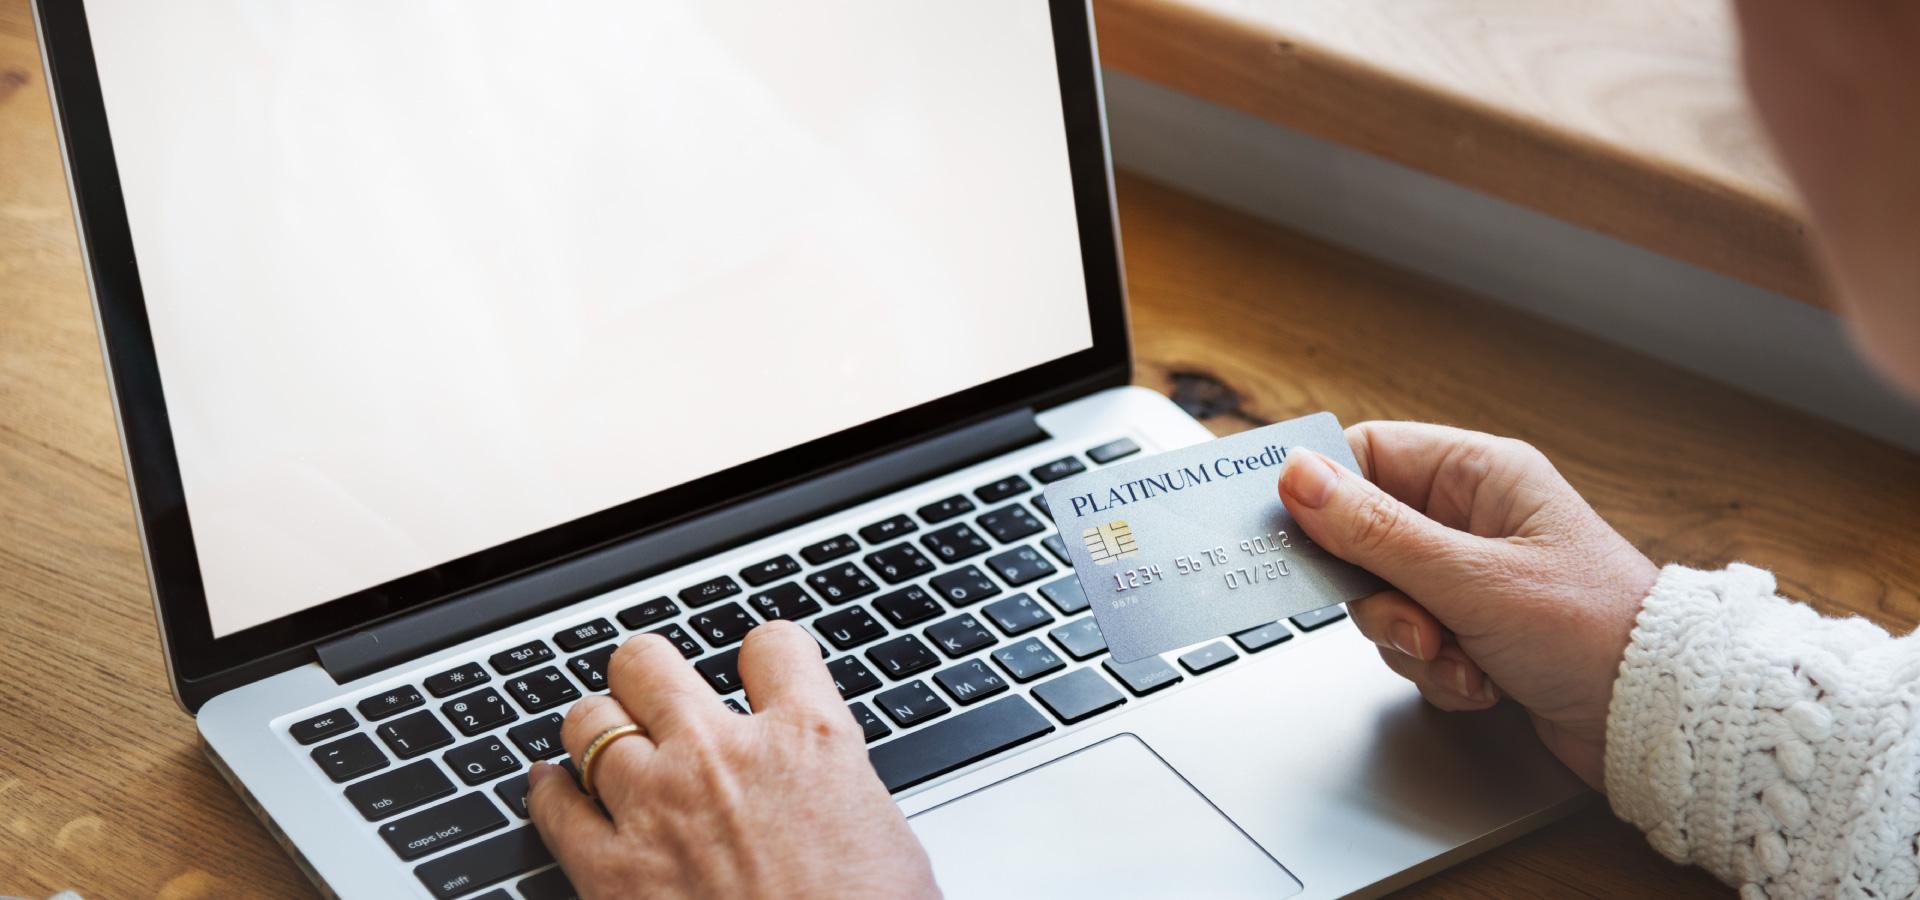 Cloud Based Payroll Software